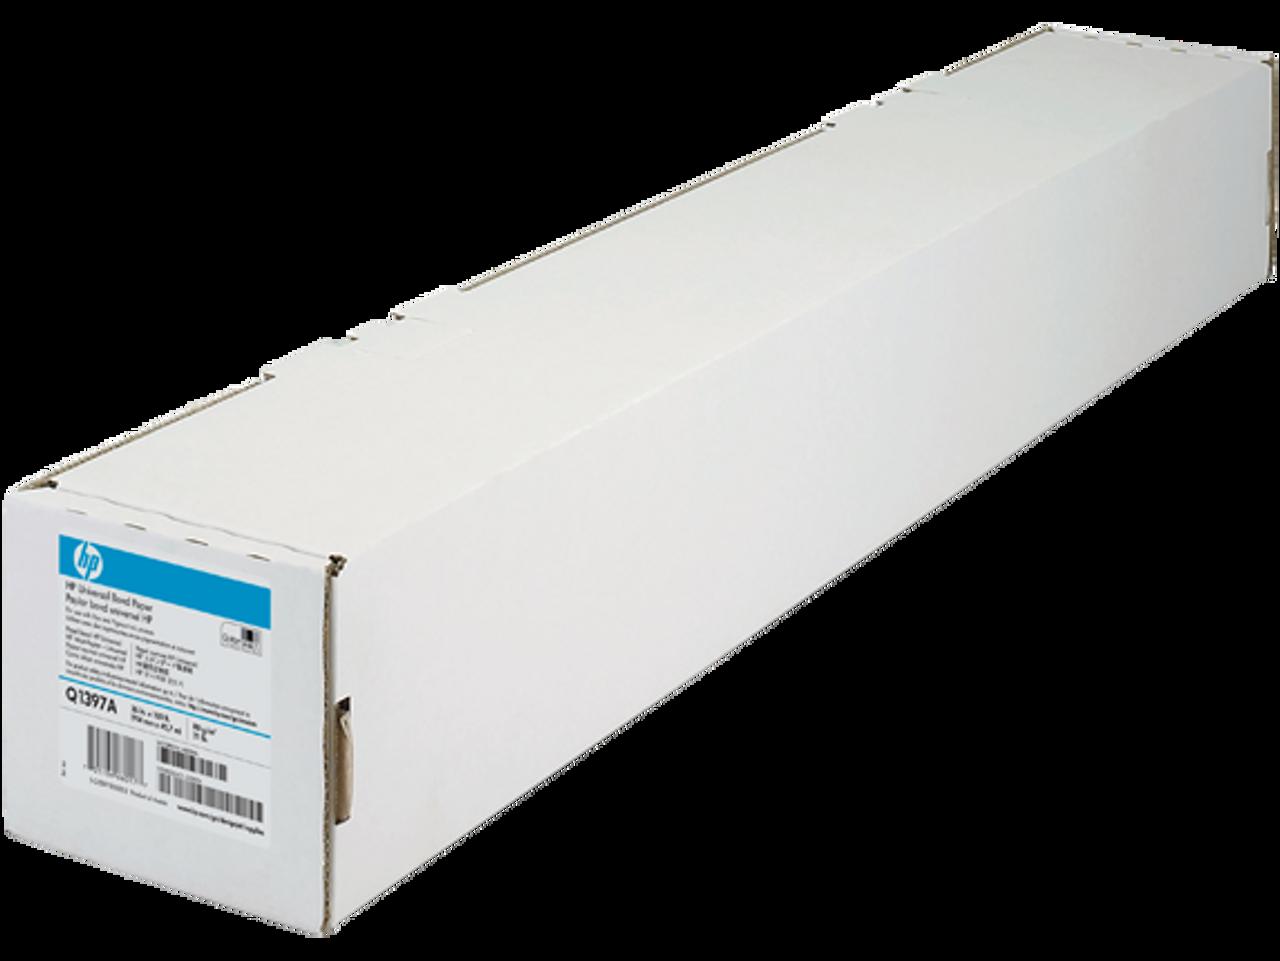 HP Bright White Plotter Paper